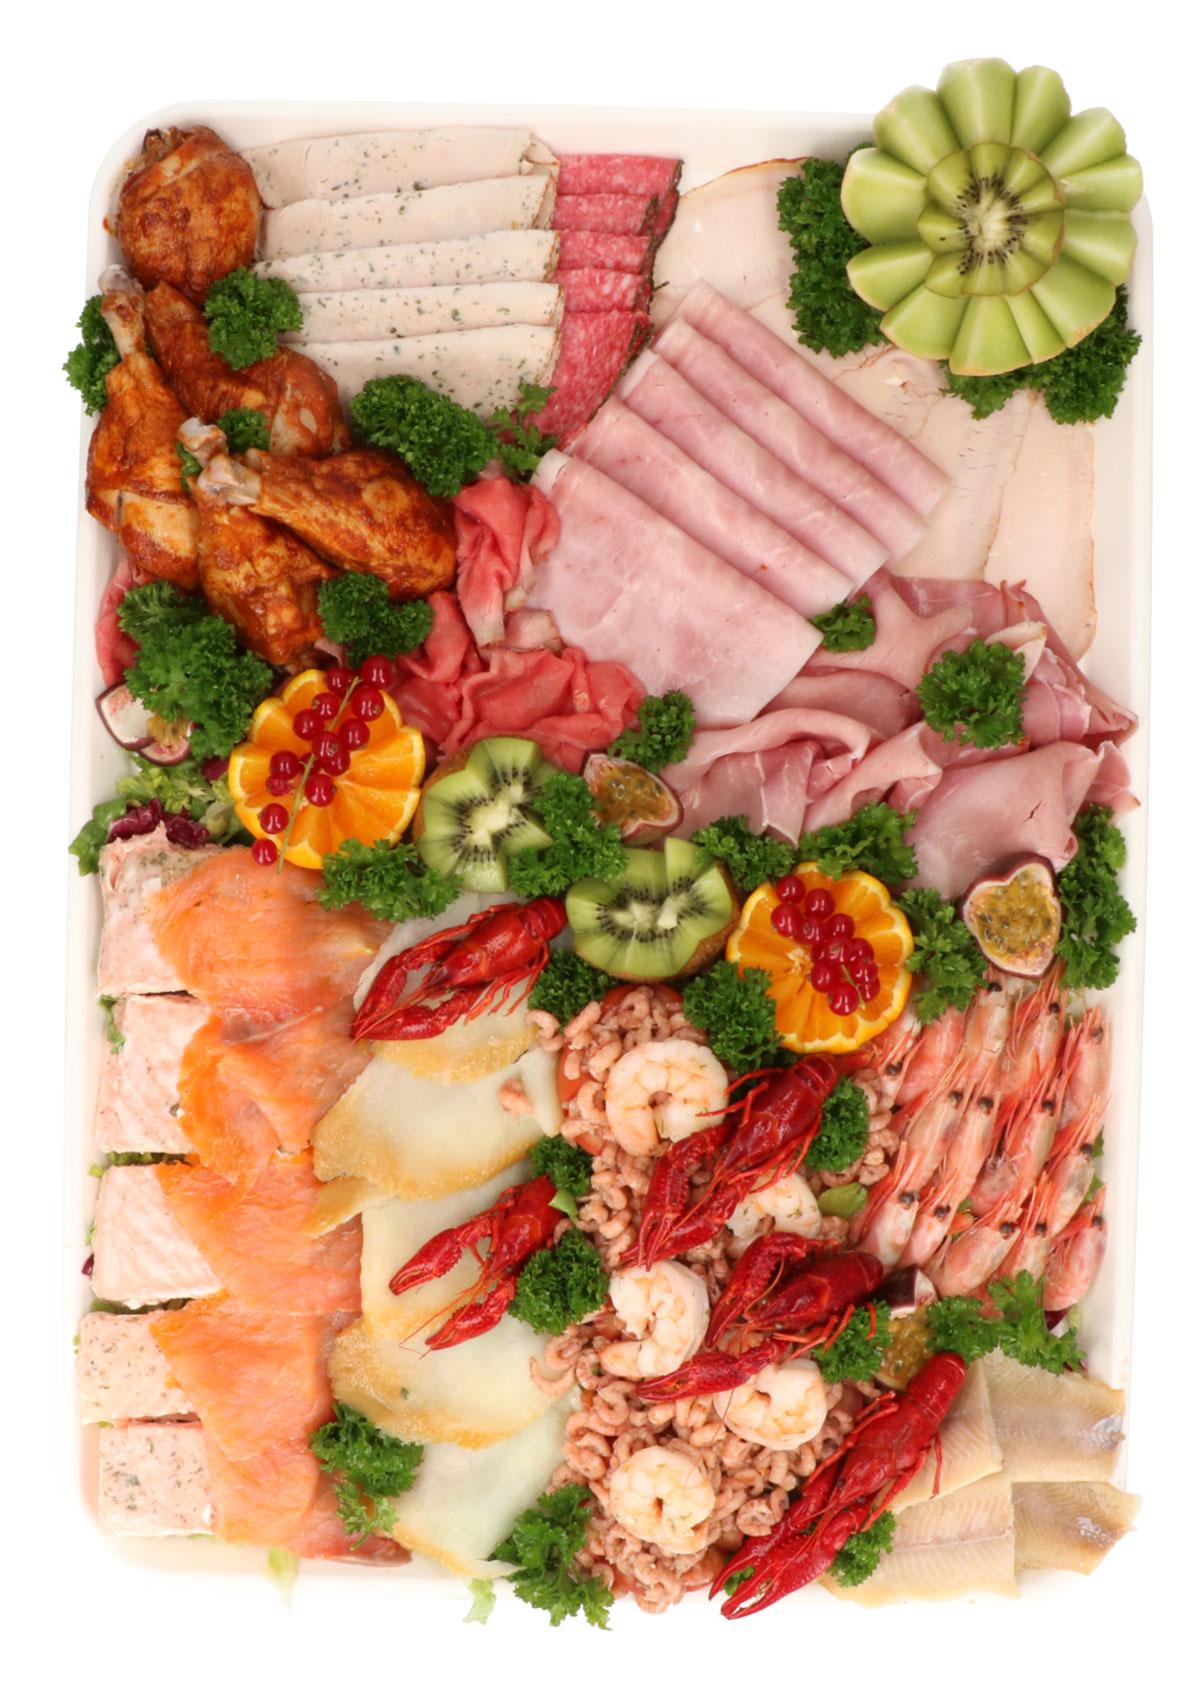 Buffet viande & poisson de luxe - De Kleine Bassin